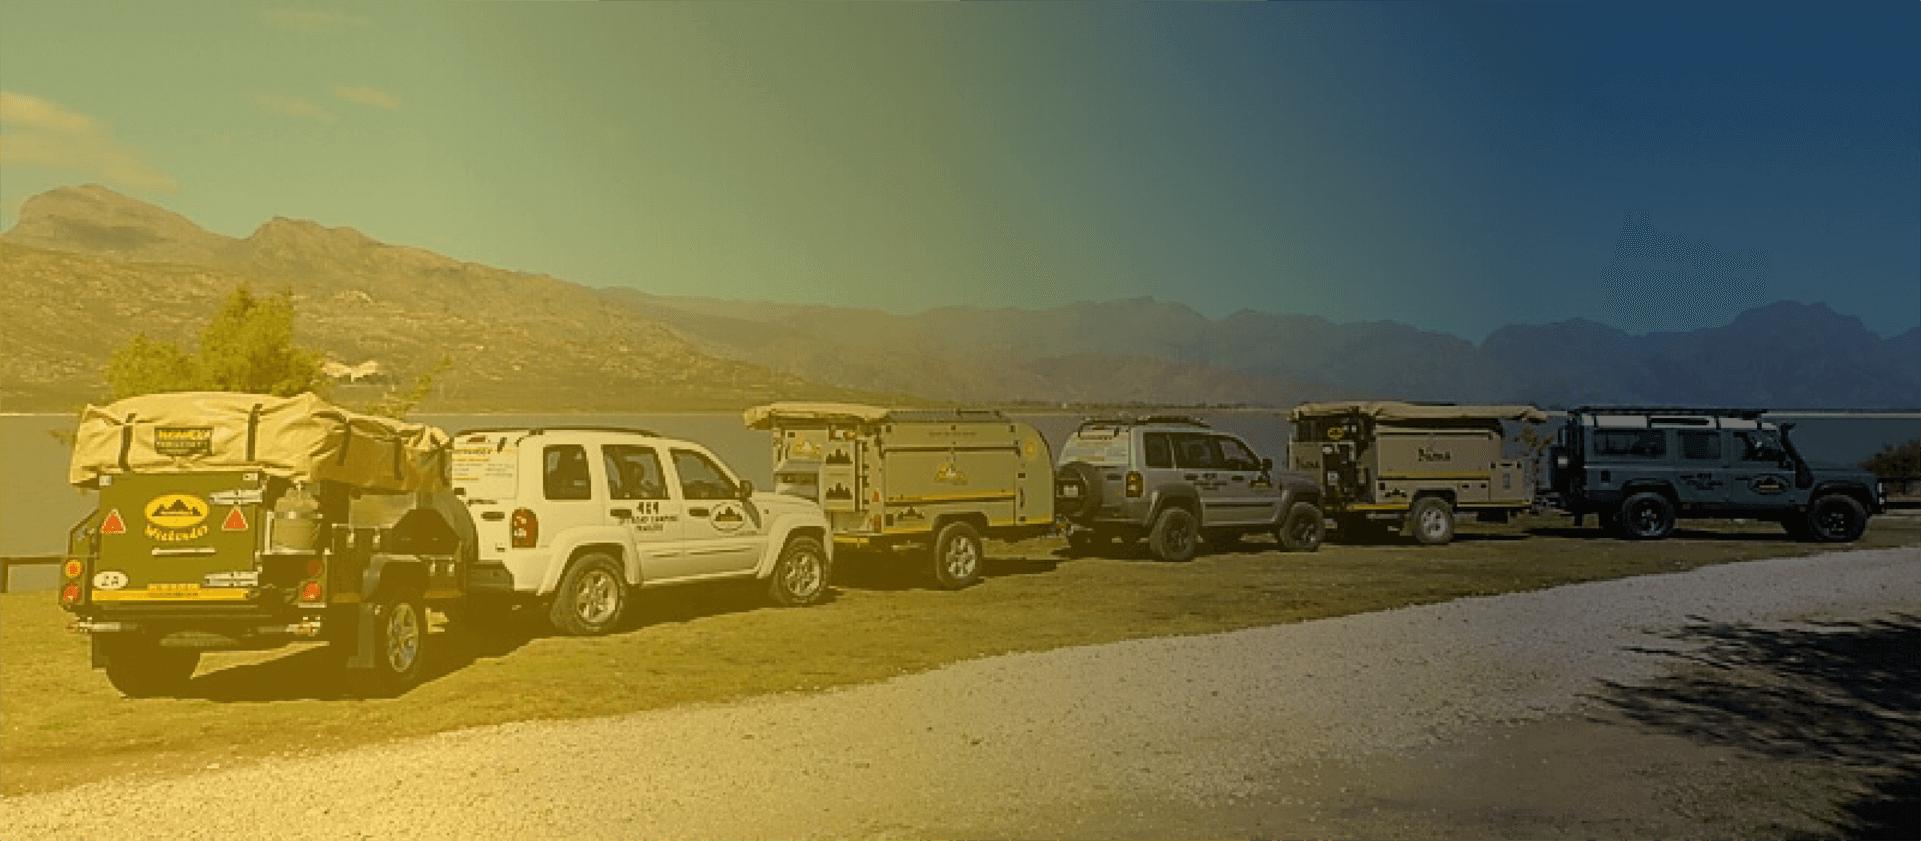 Bushwakka-4x4-Trailers-Caravans_oct_18_tint_transp